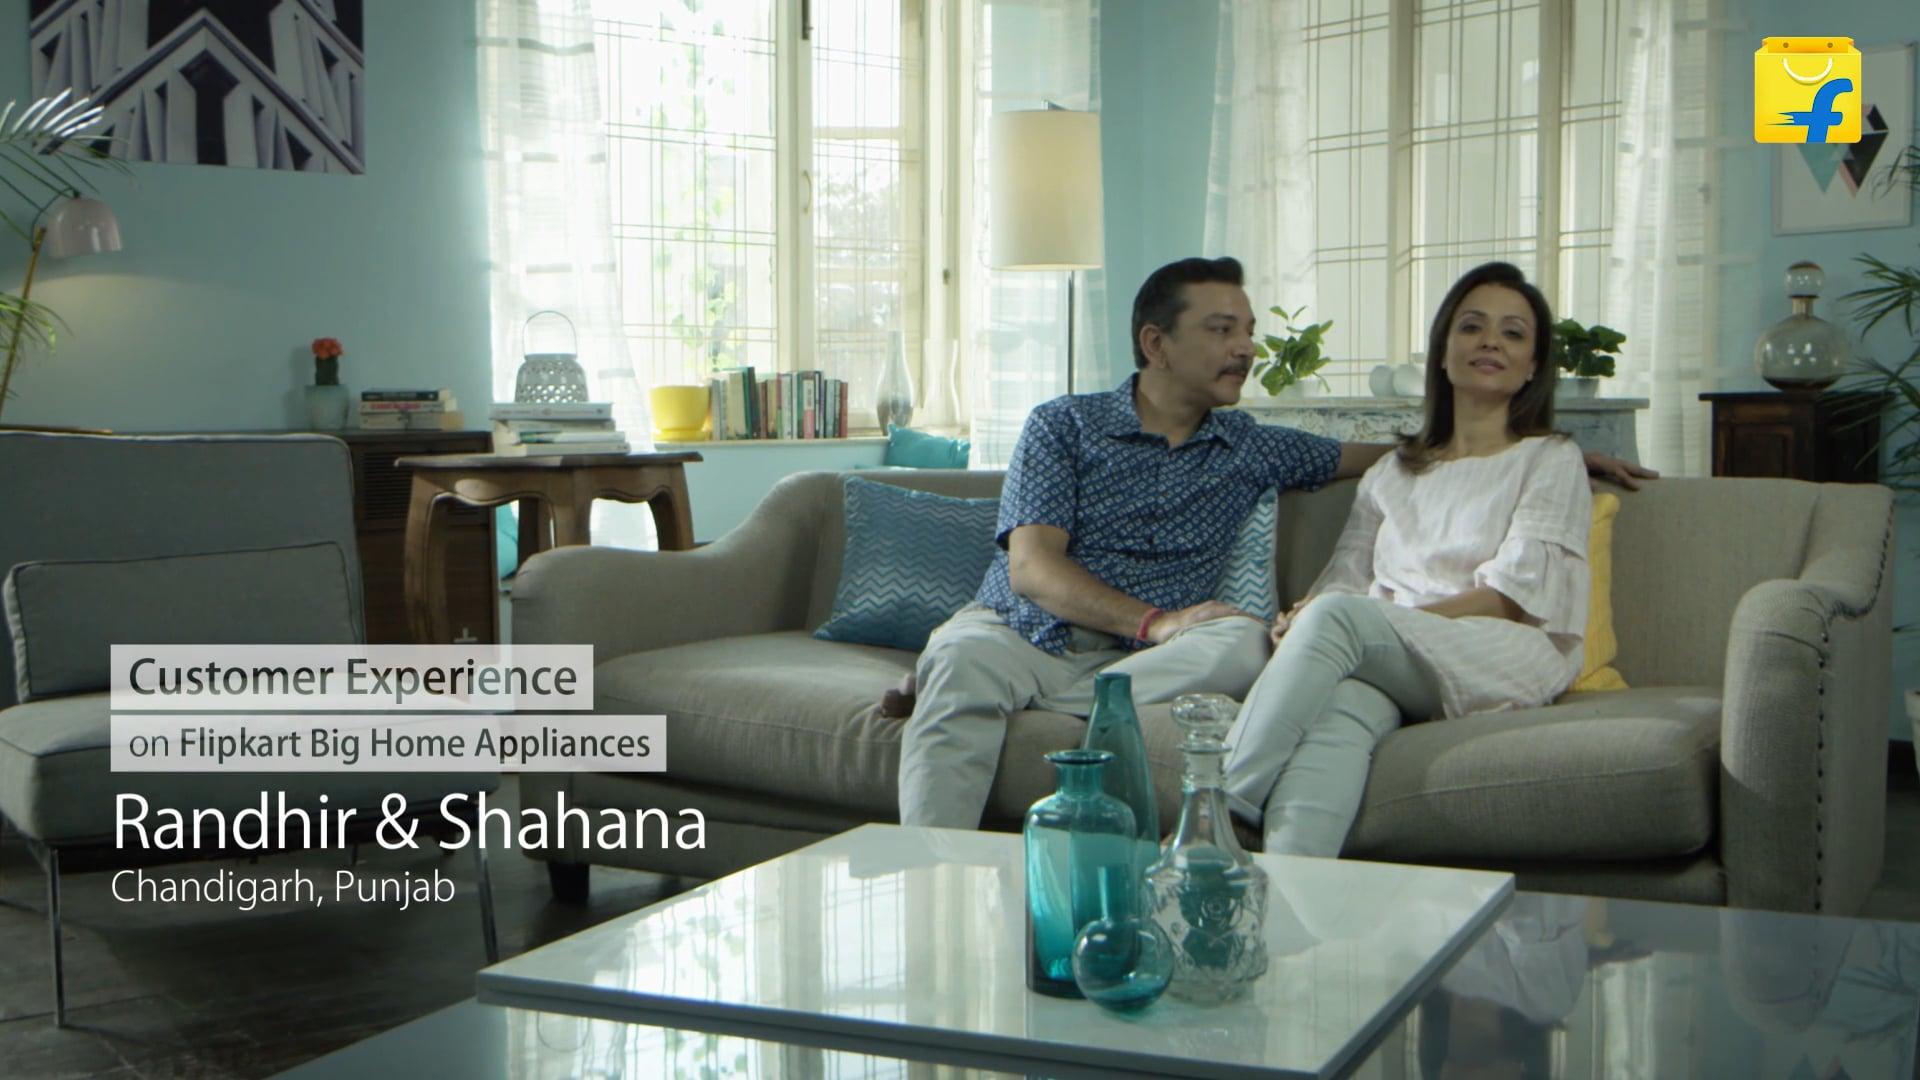 Flipkart: Large Appliances: Customer Testimonial